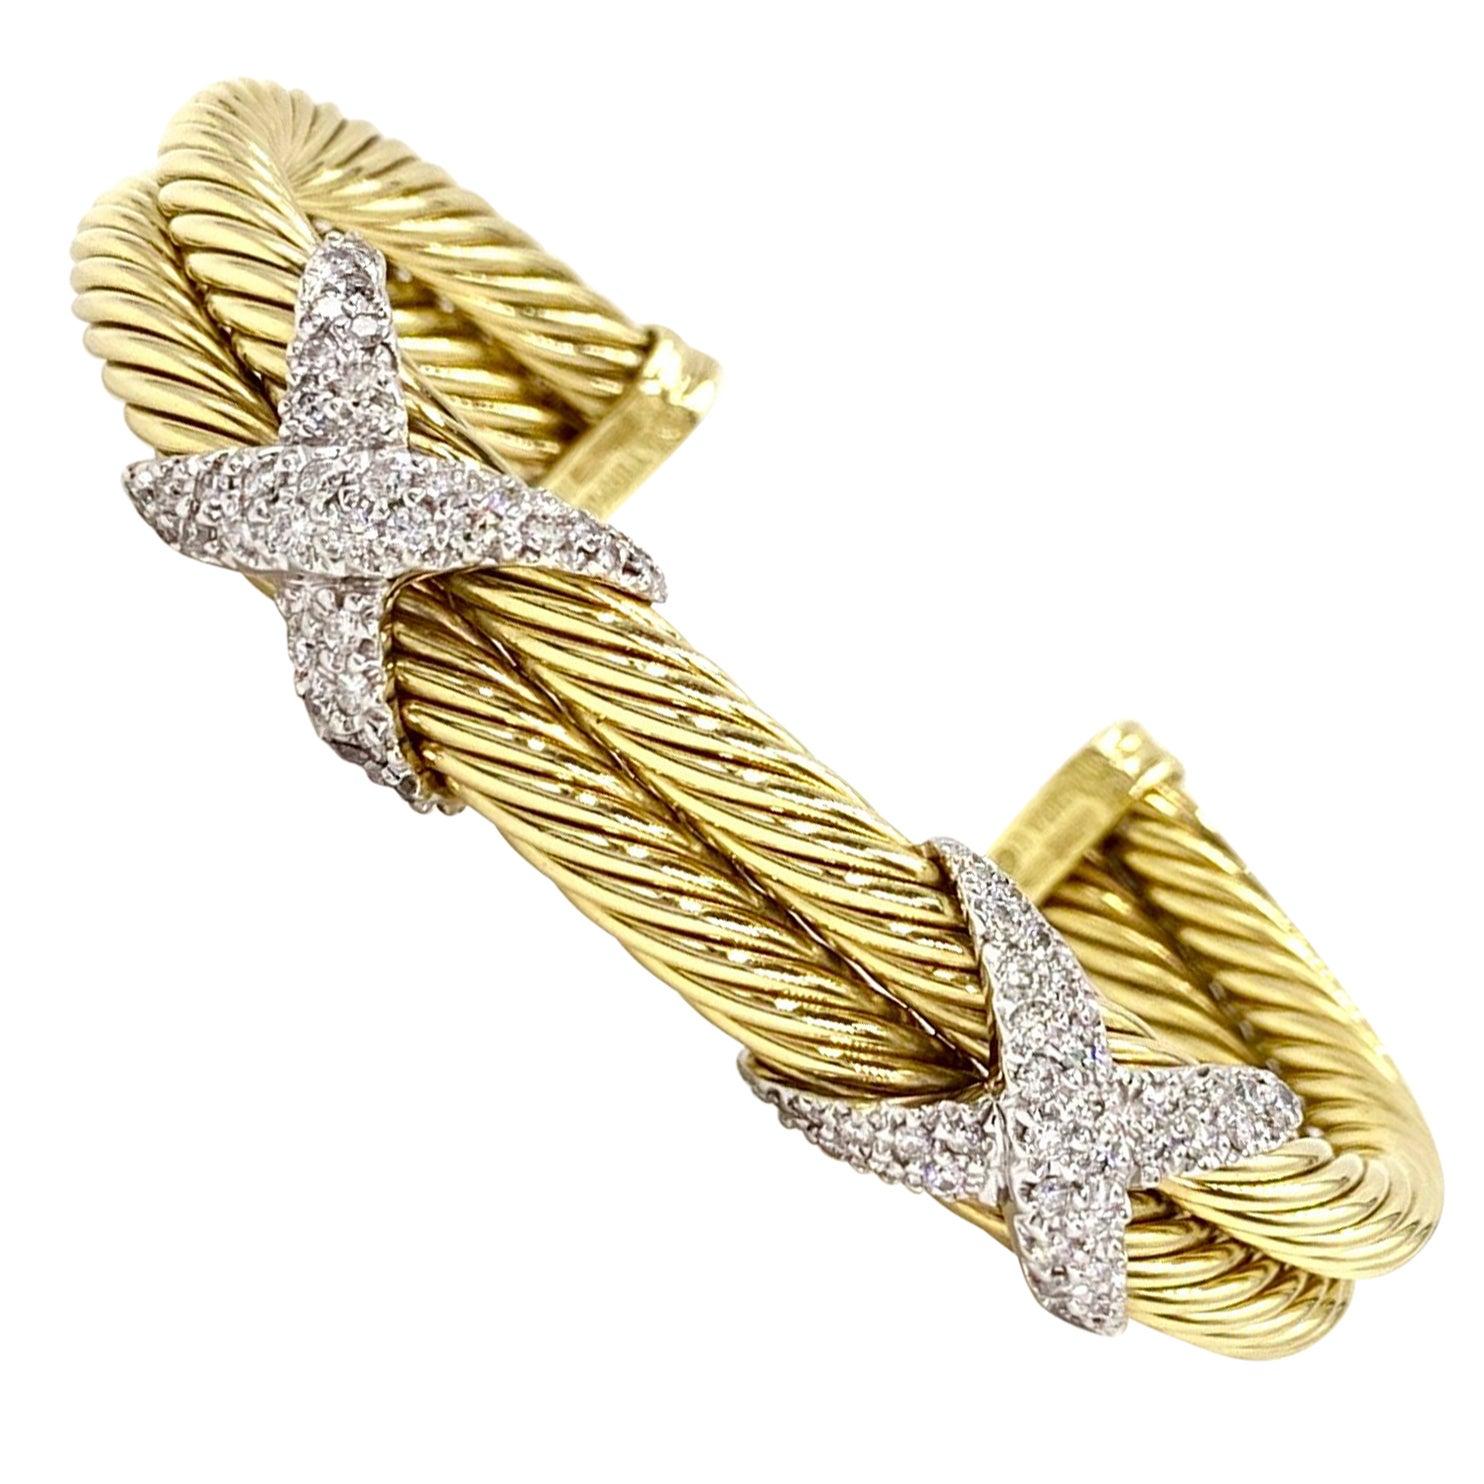 David Yurman 18 Karat Yellow Gold and Diamond Cable Cuff Bracelet